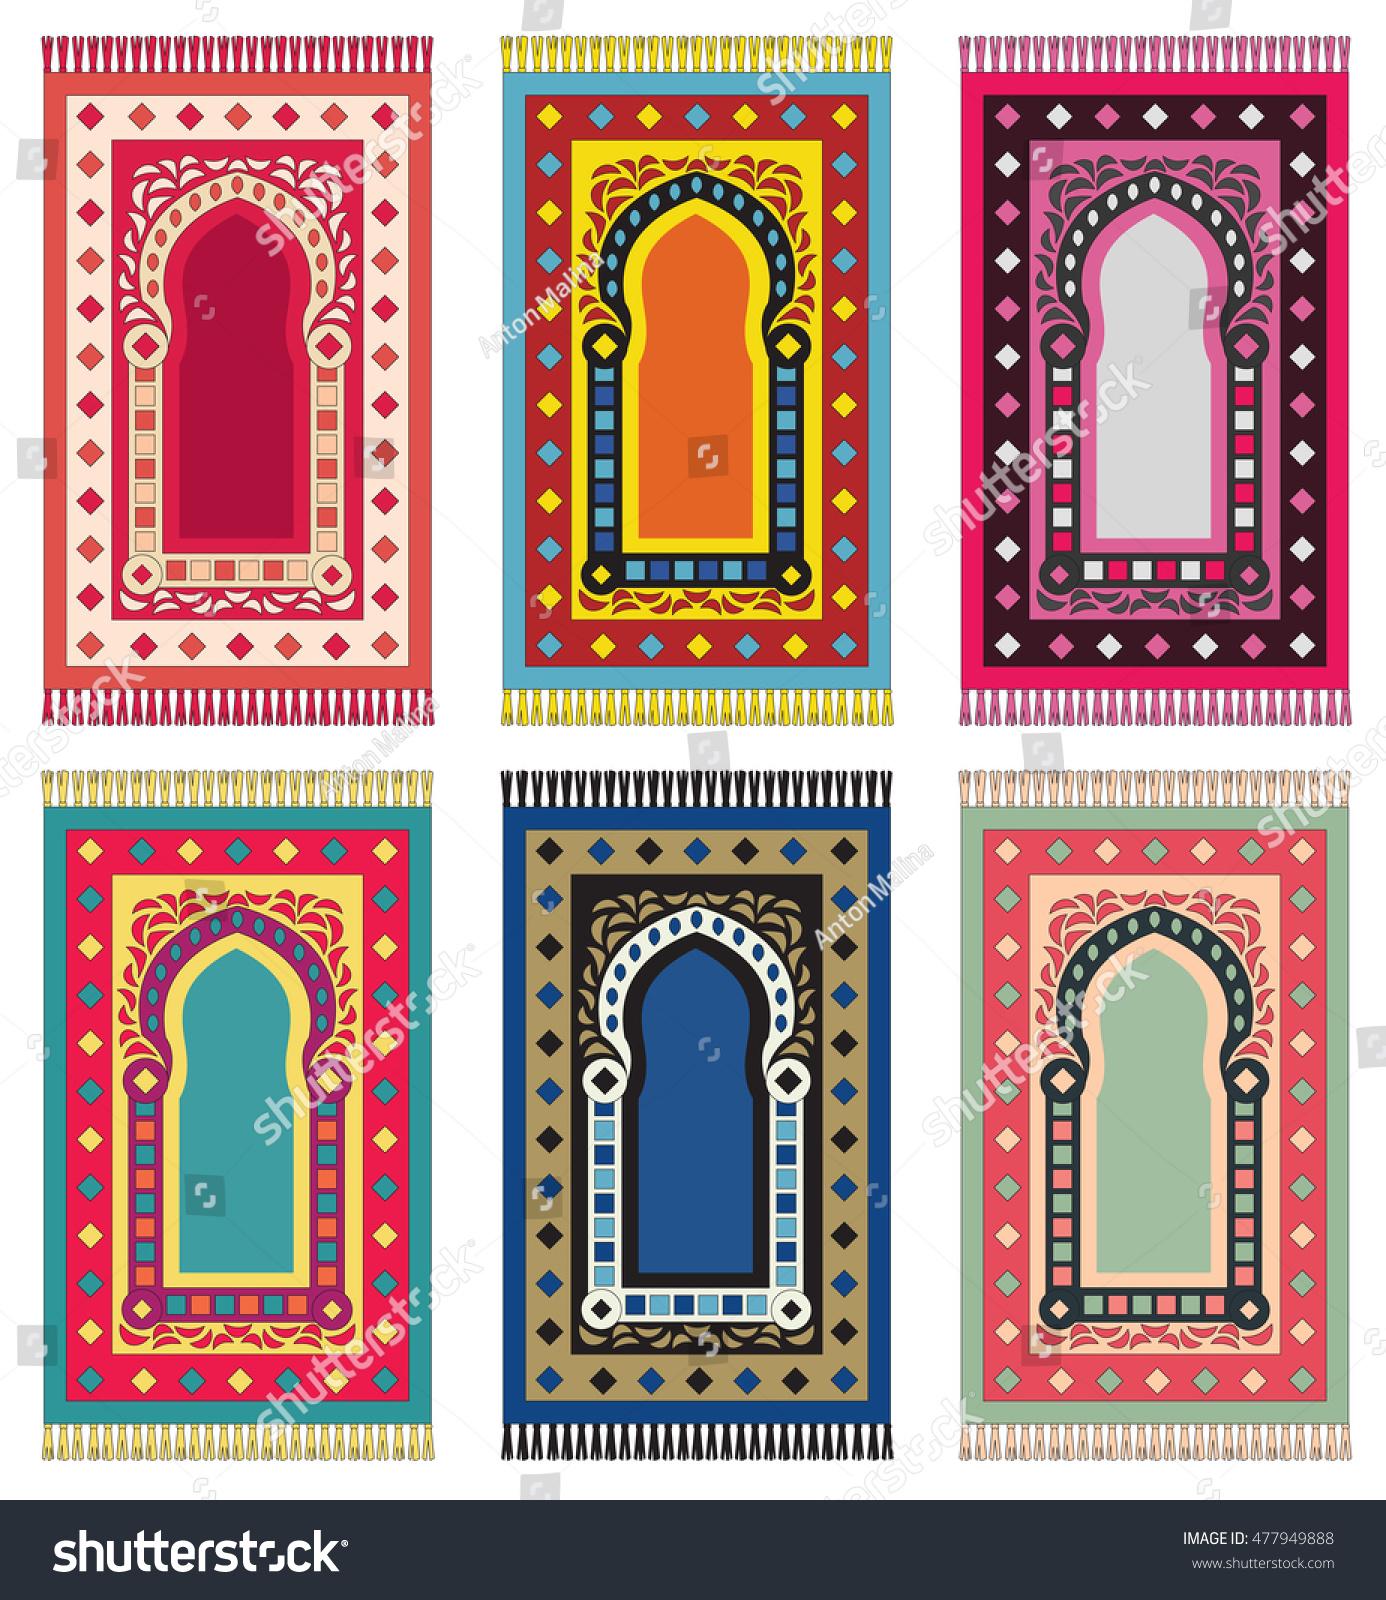 Muslim Prayer Rug. Islamic Textile. Mosque Flooring. Praying Mats. Middle  Eastern Pattern